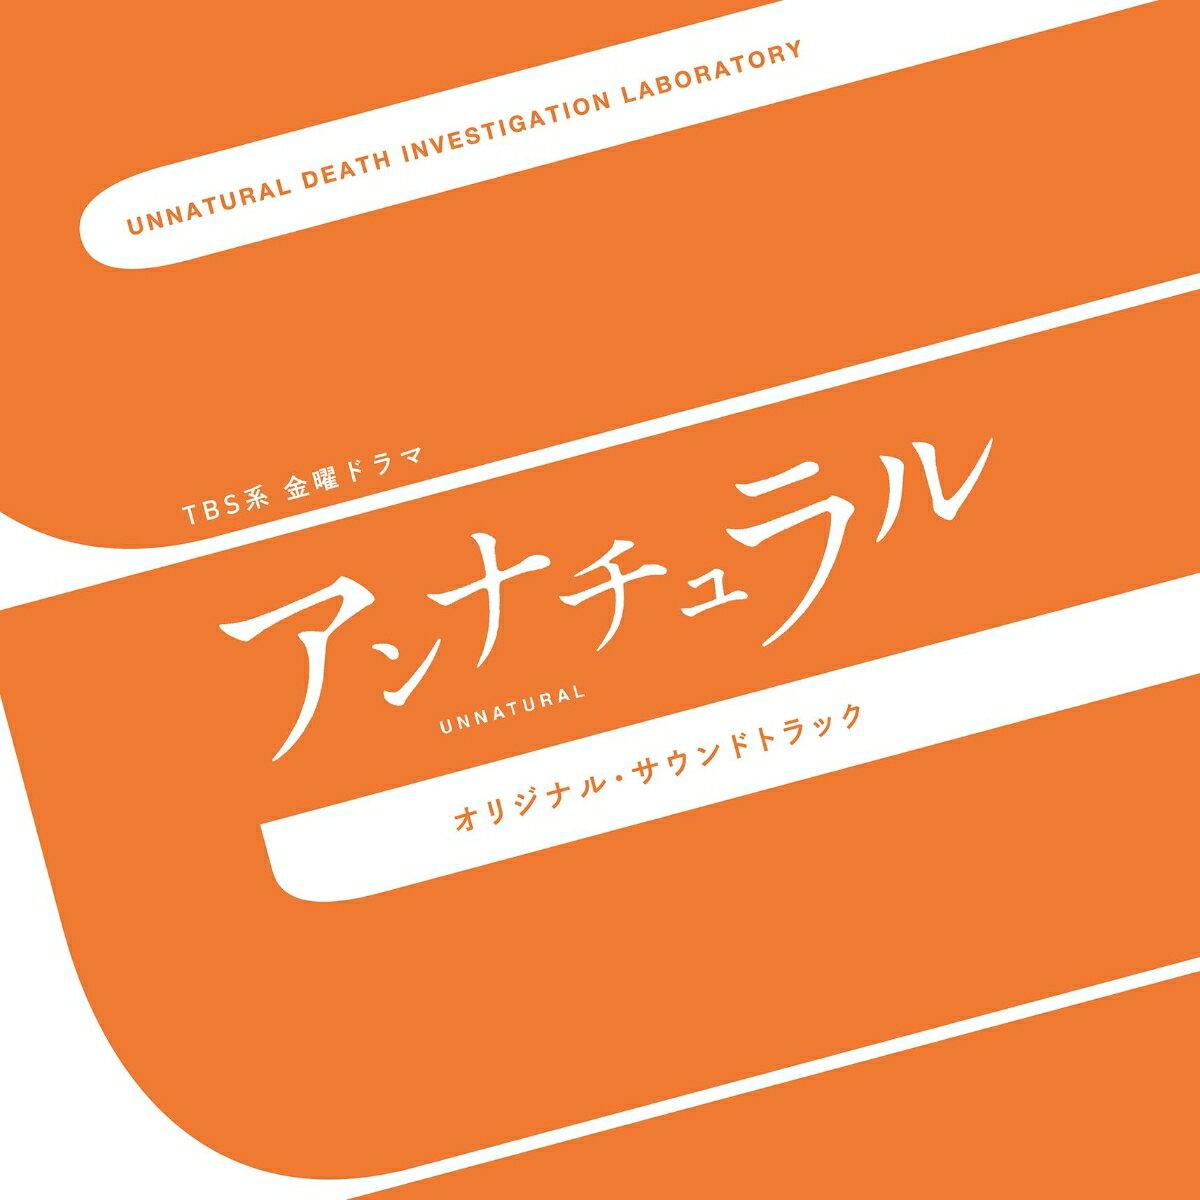 TBS系 金曜ドラマ アンナチュラル オリジナル・サウンドトラック [ (オリジナル・サウンドトラック) ]